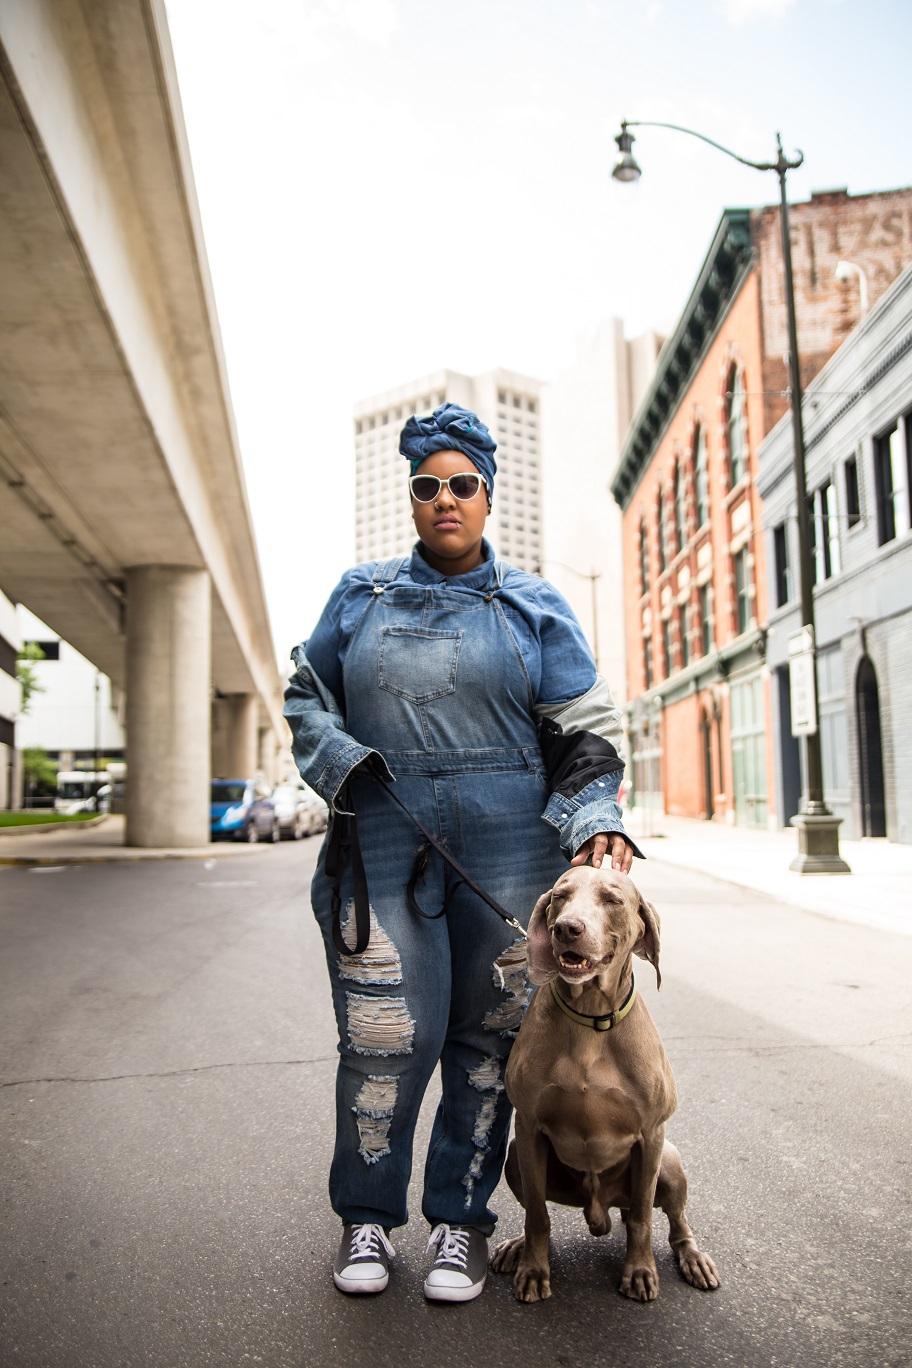 Leah-Vernon-Plus-Size-Model-Detroit-Blogger-Muslim-Girl-Body-positive-dogs-of-instagram